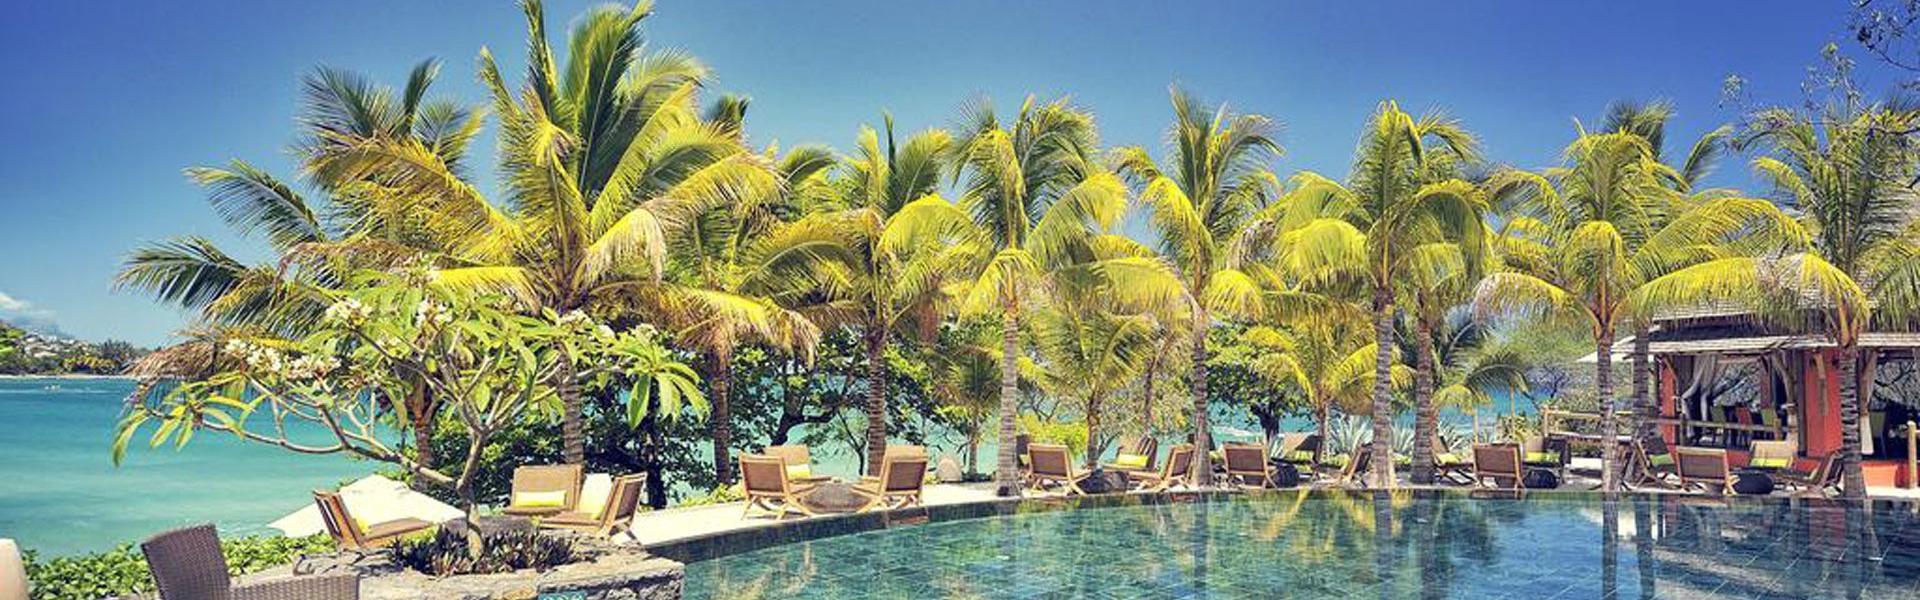 Tamarina Golf & Spa Boutique Hotel (Mauritiusi utazások)